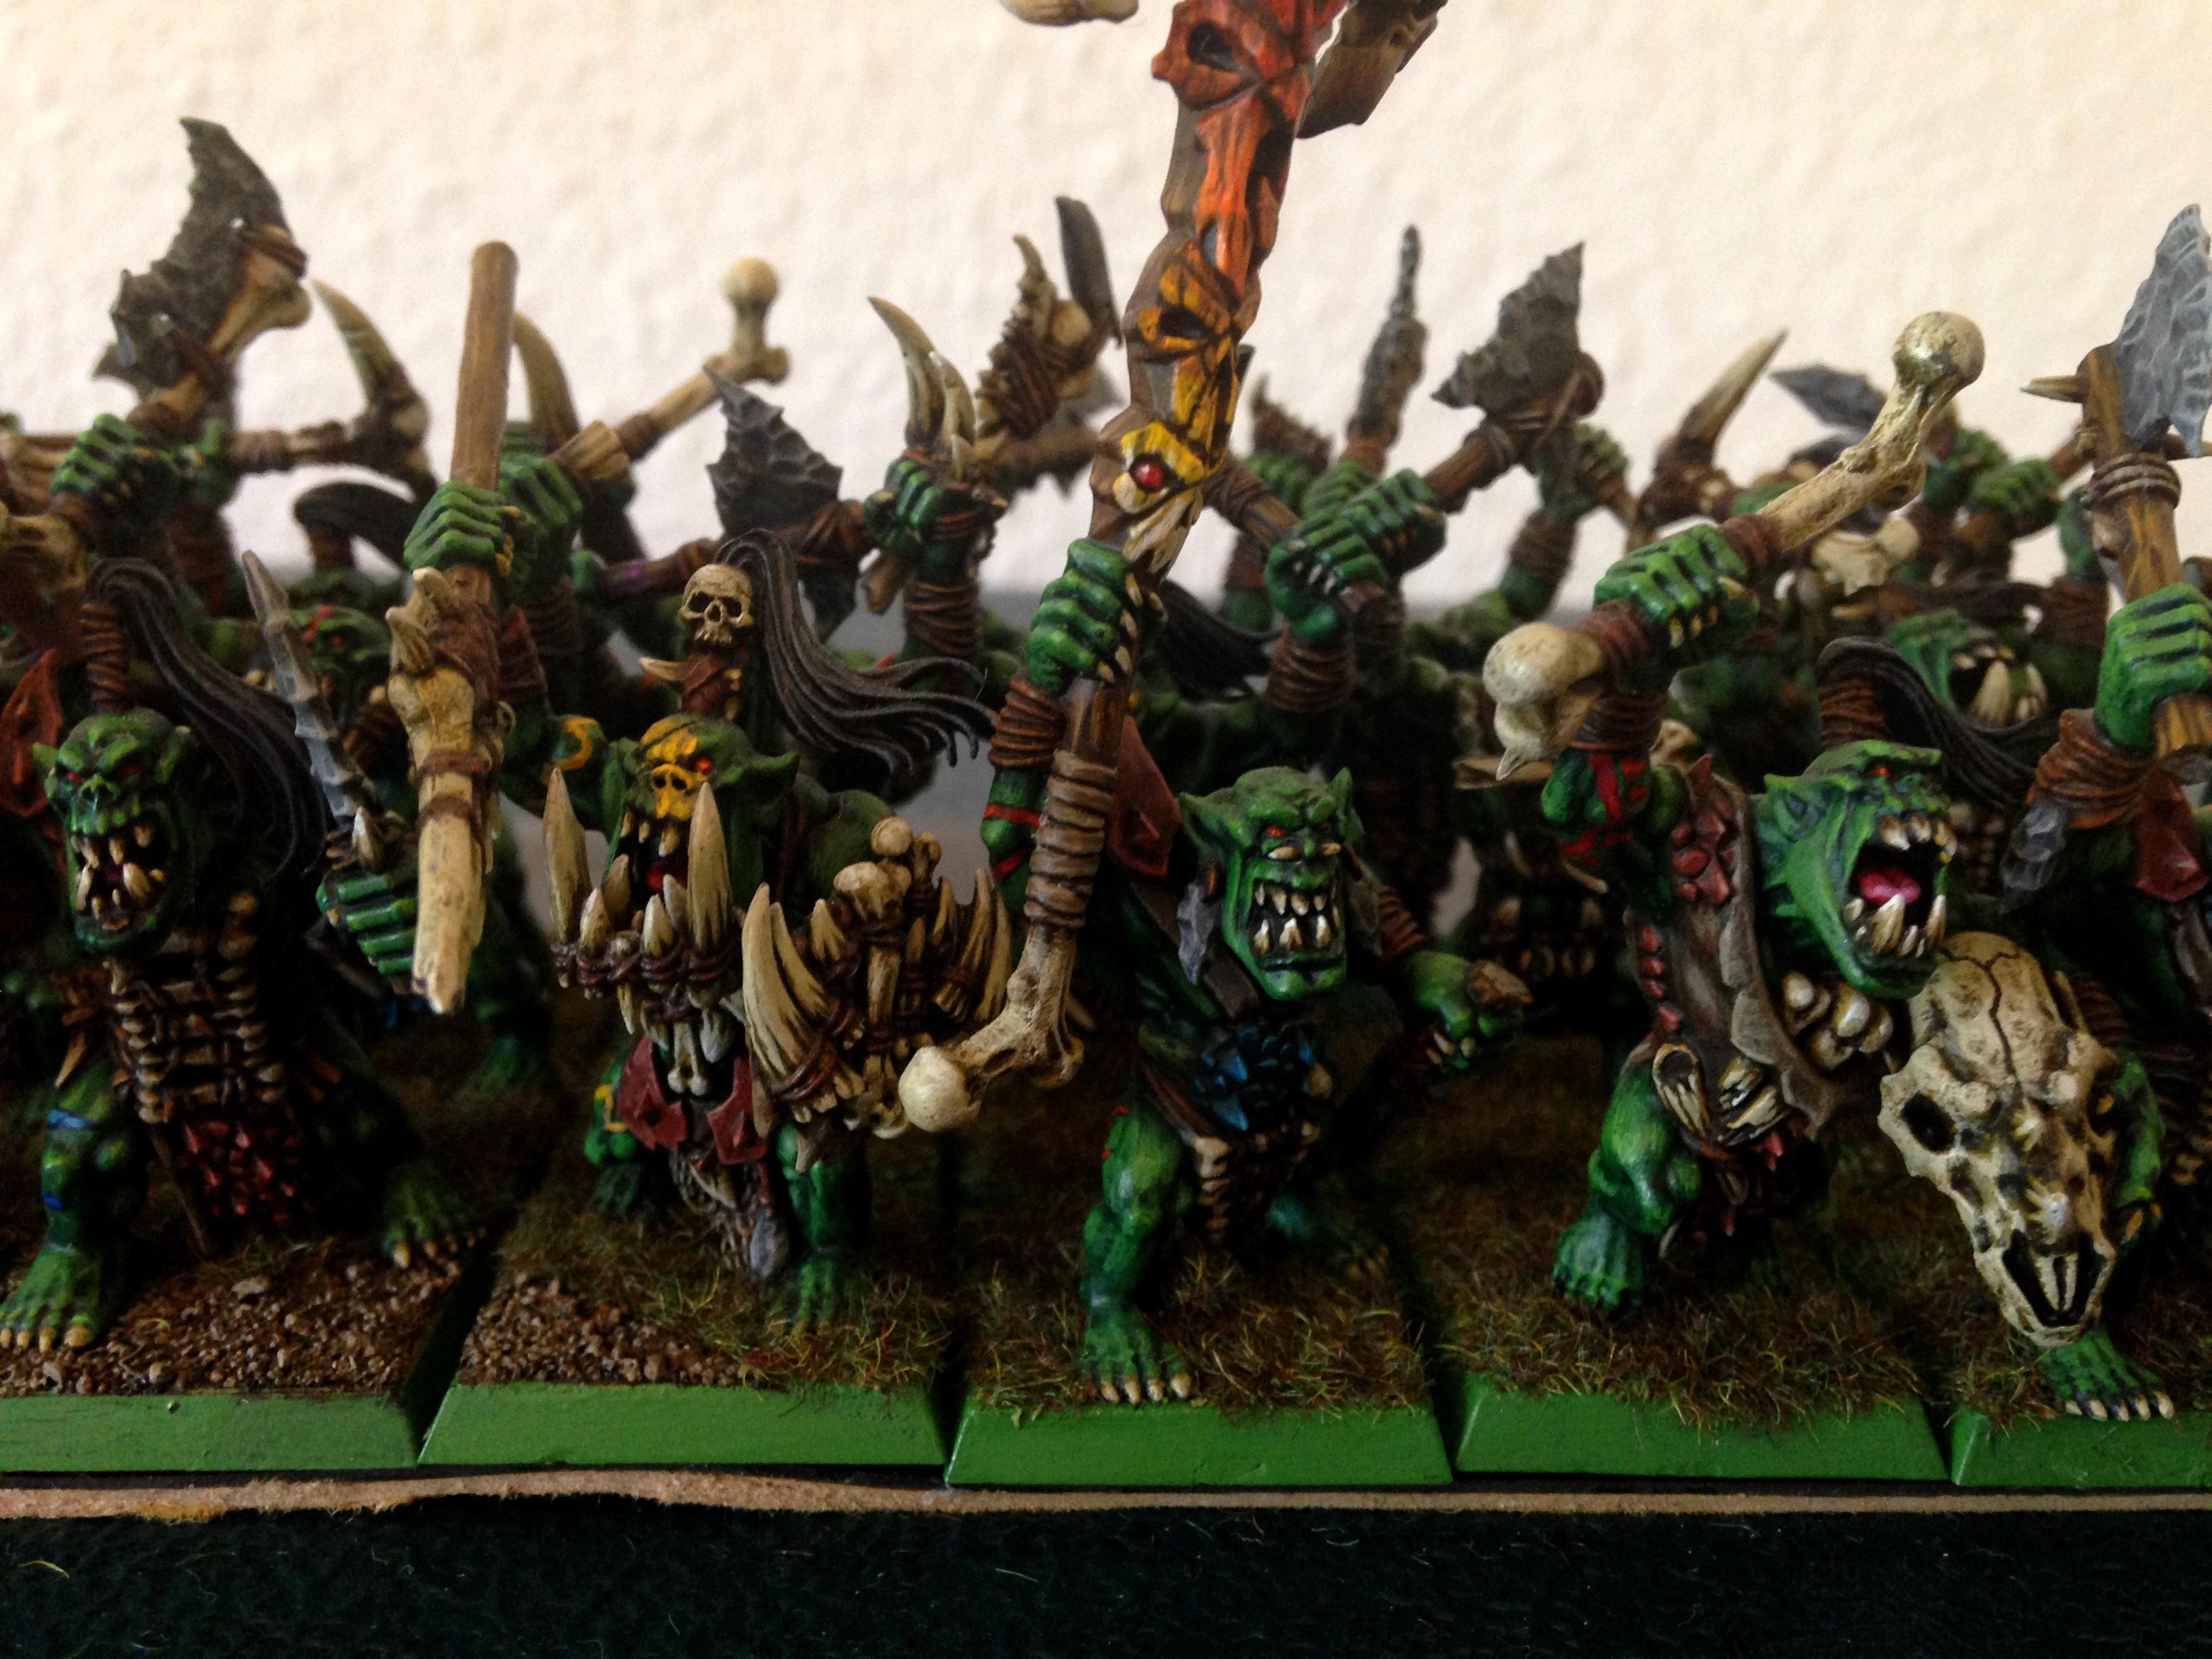 Orcs And Goblins, Savage Orcs, Warhammer Fantasy